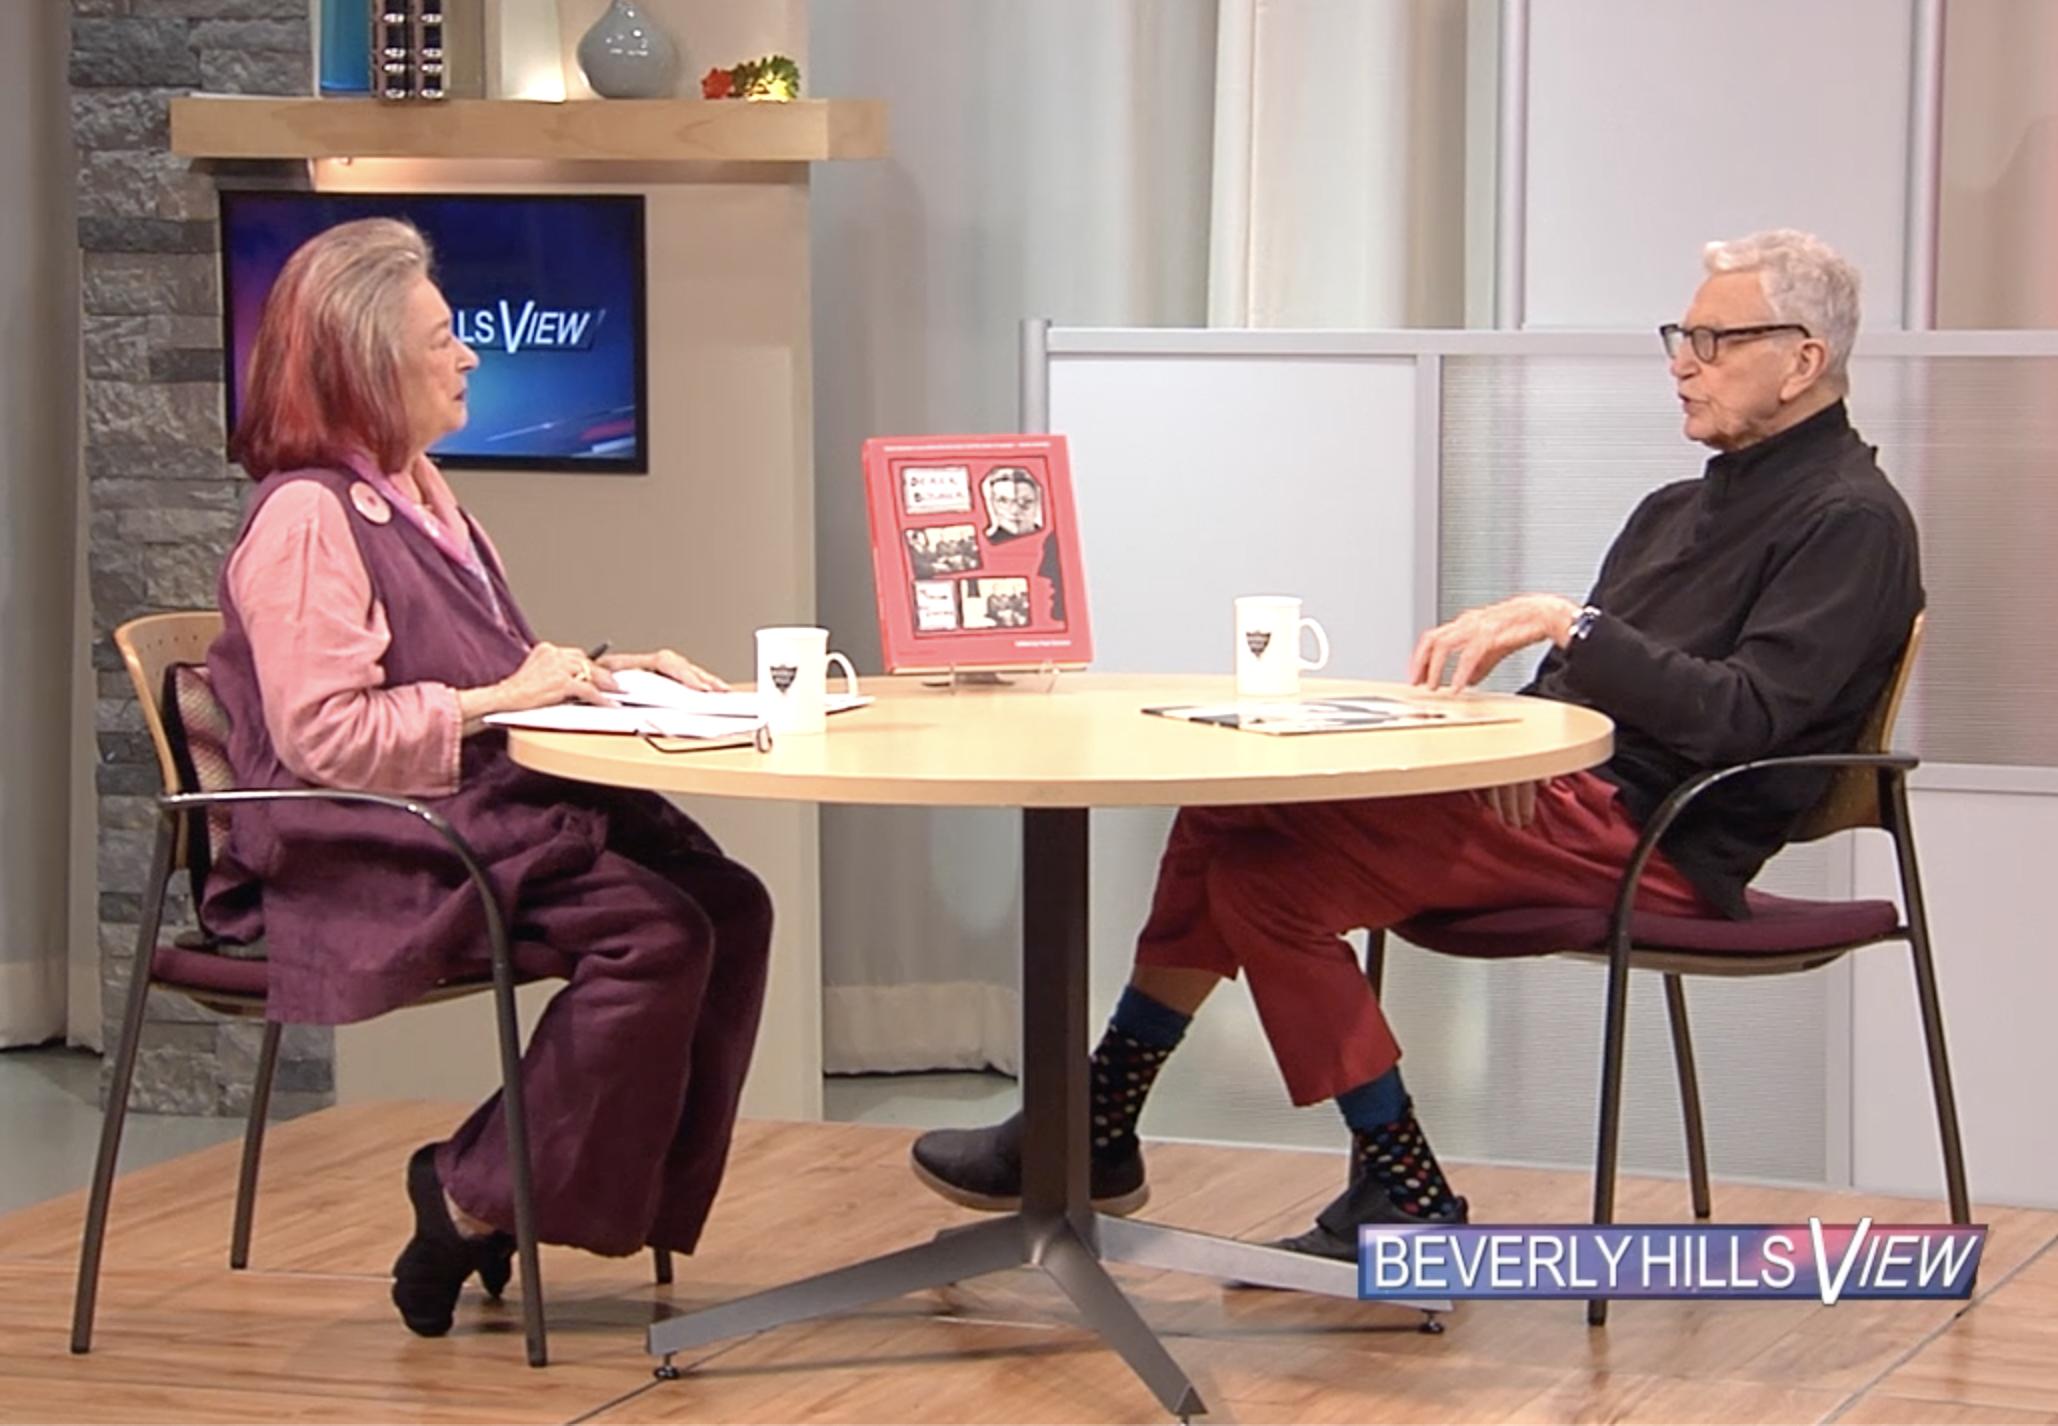 DEREK BOSHIER   BEVERLY HILLS VIEW   17 JANUARY 2020